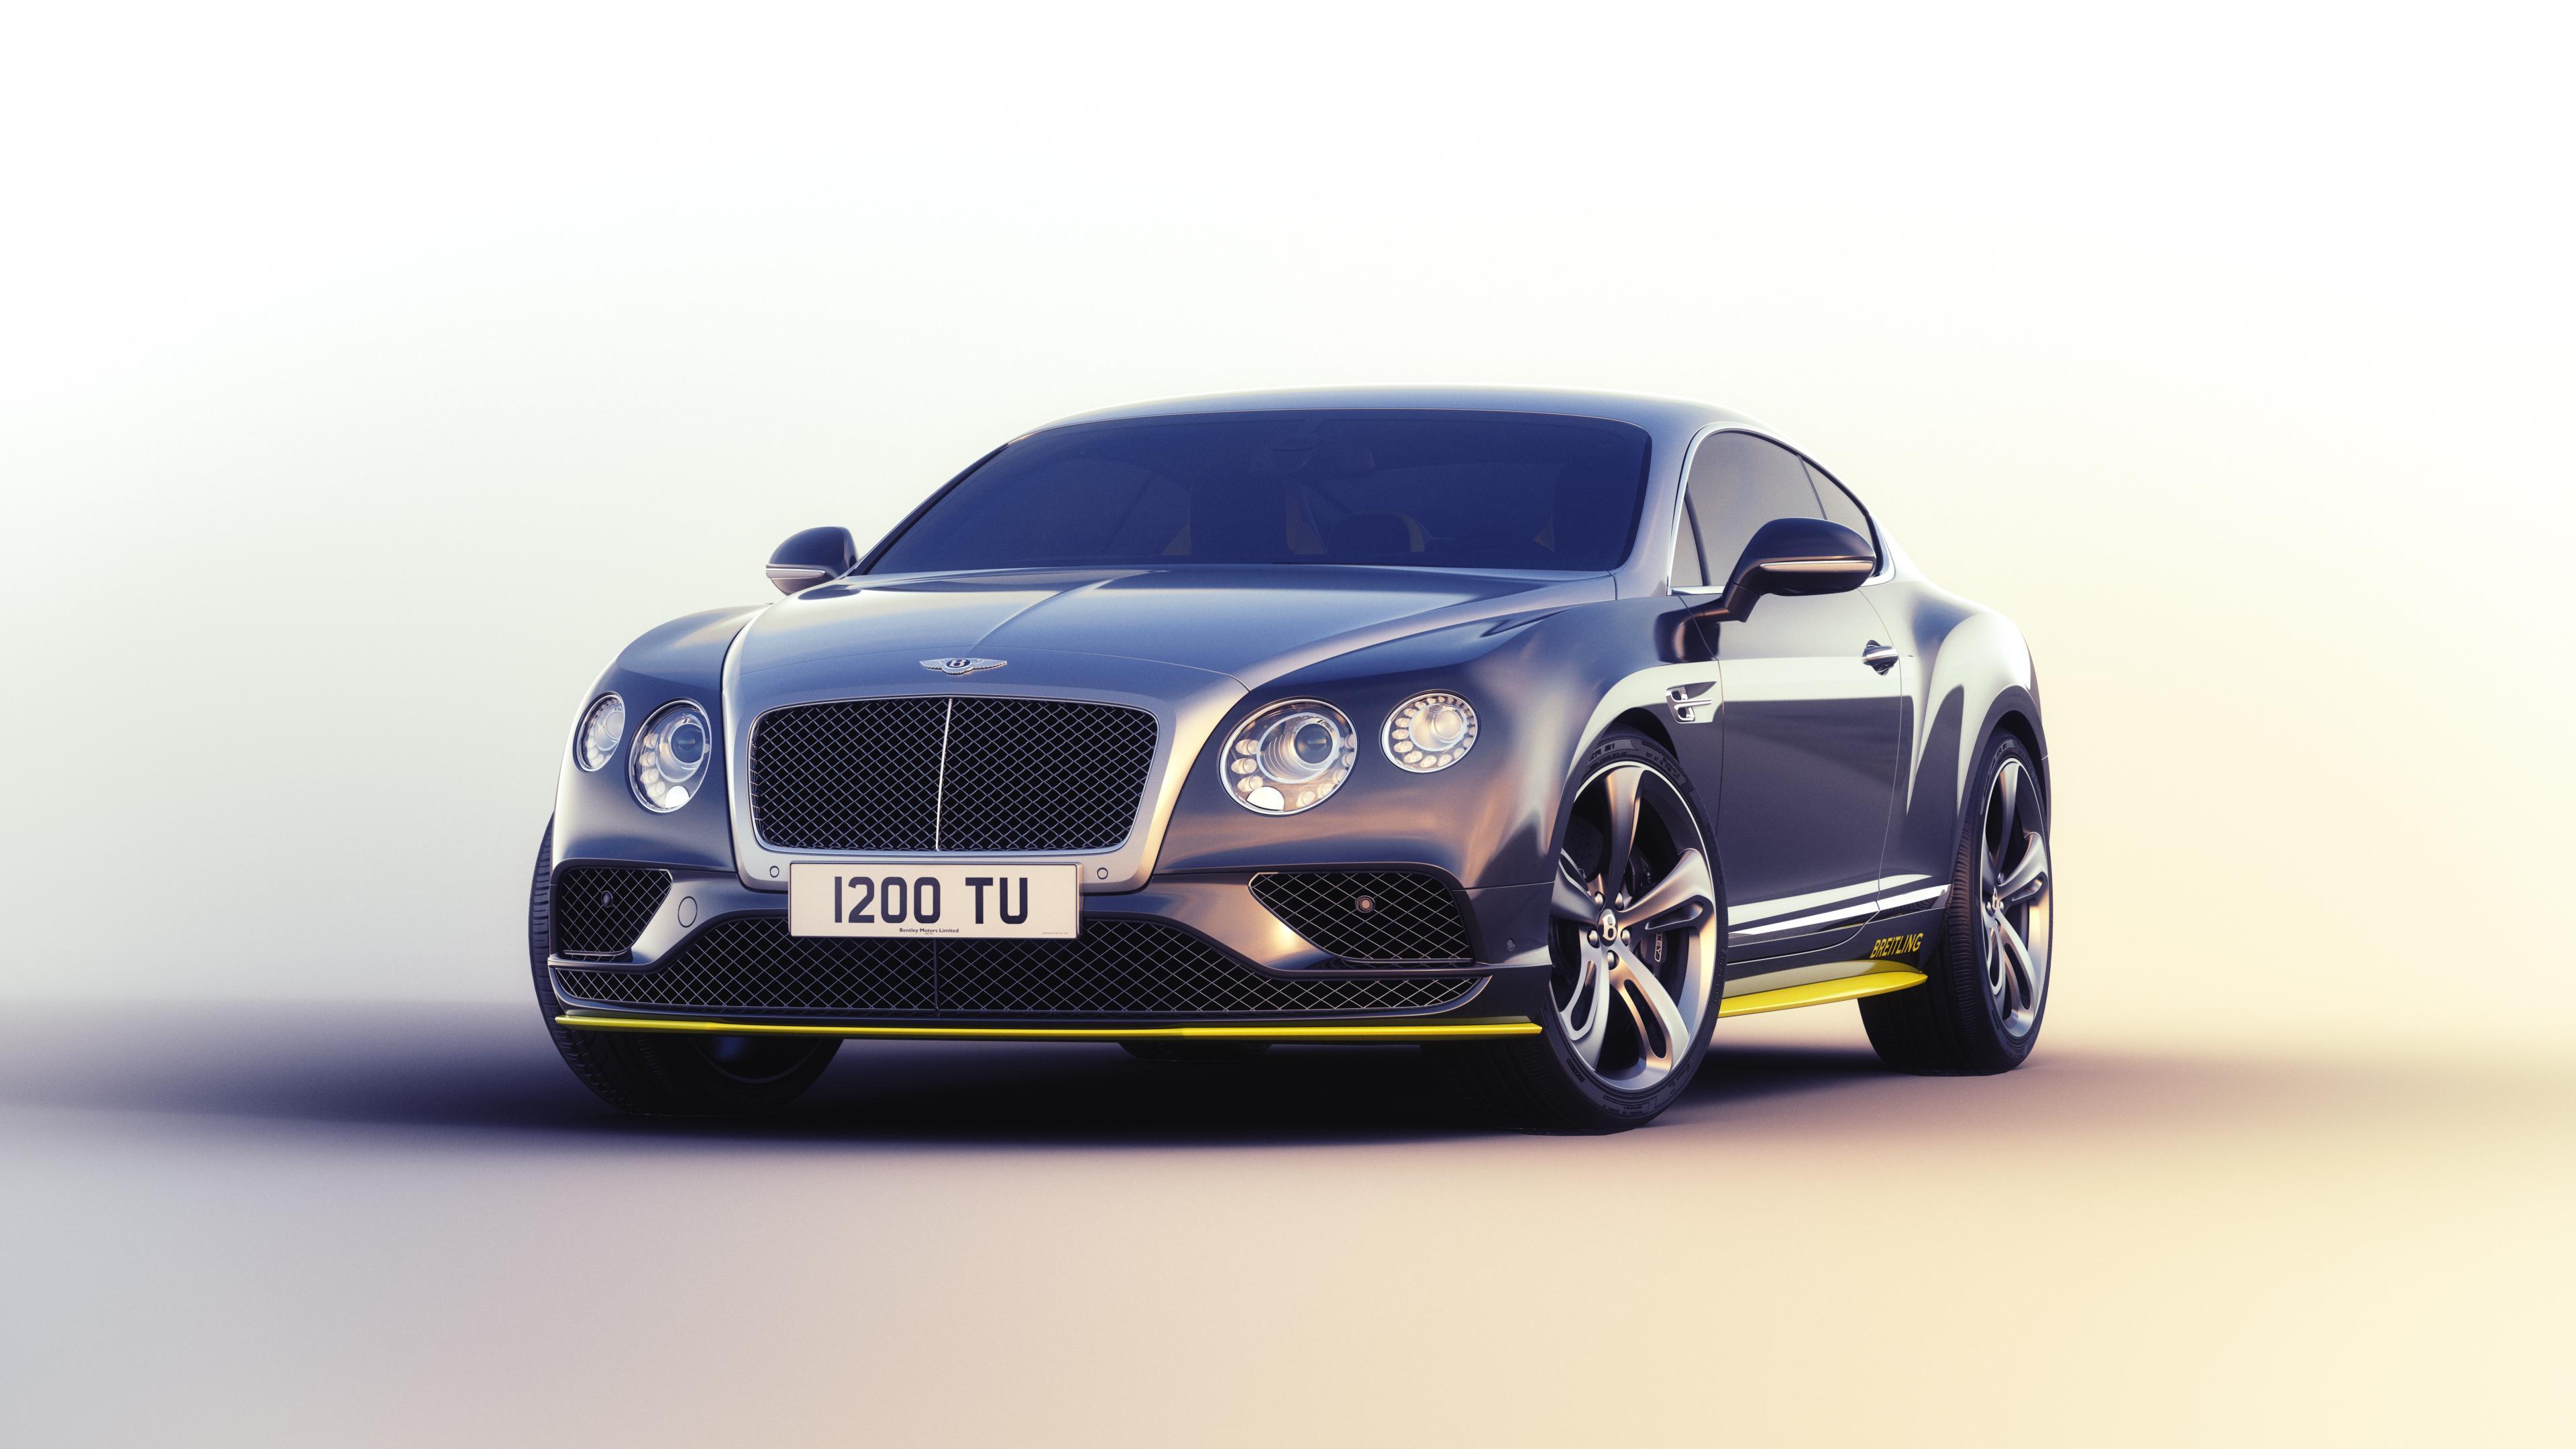 New Bentley Continental Gt Review Has Bentley S New Gt Been Worth The Wait Evo